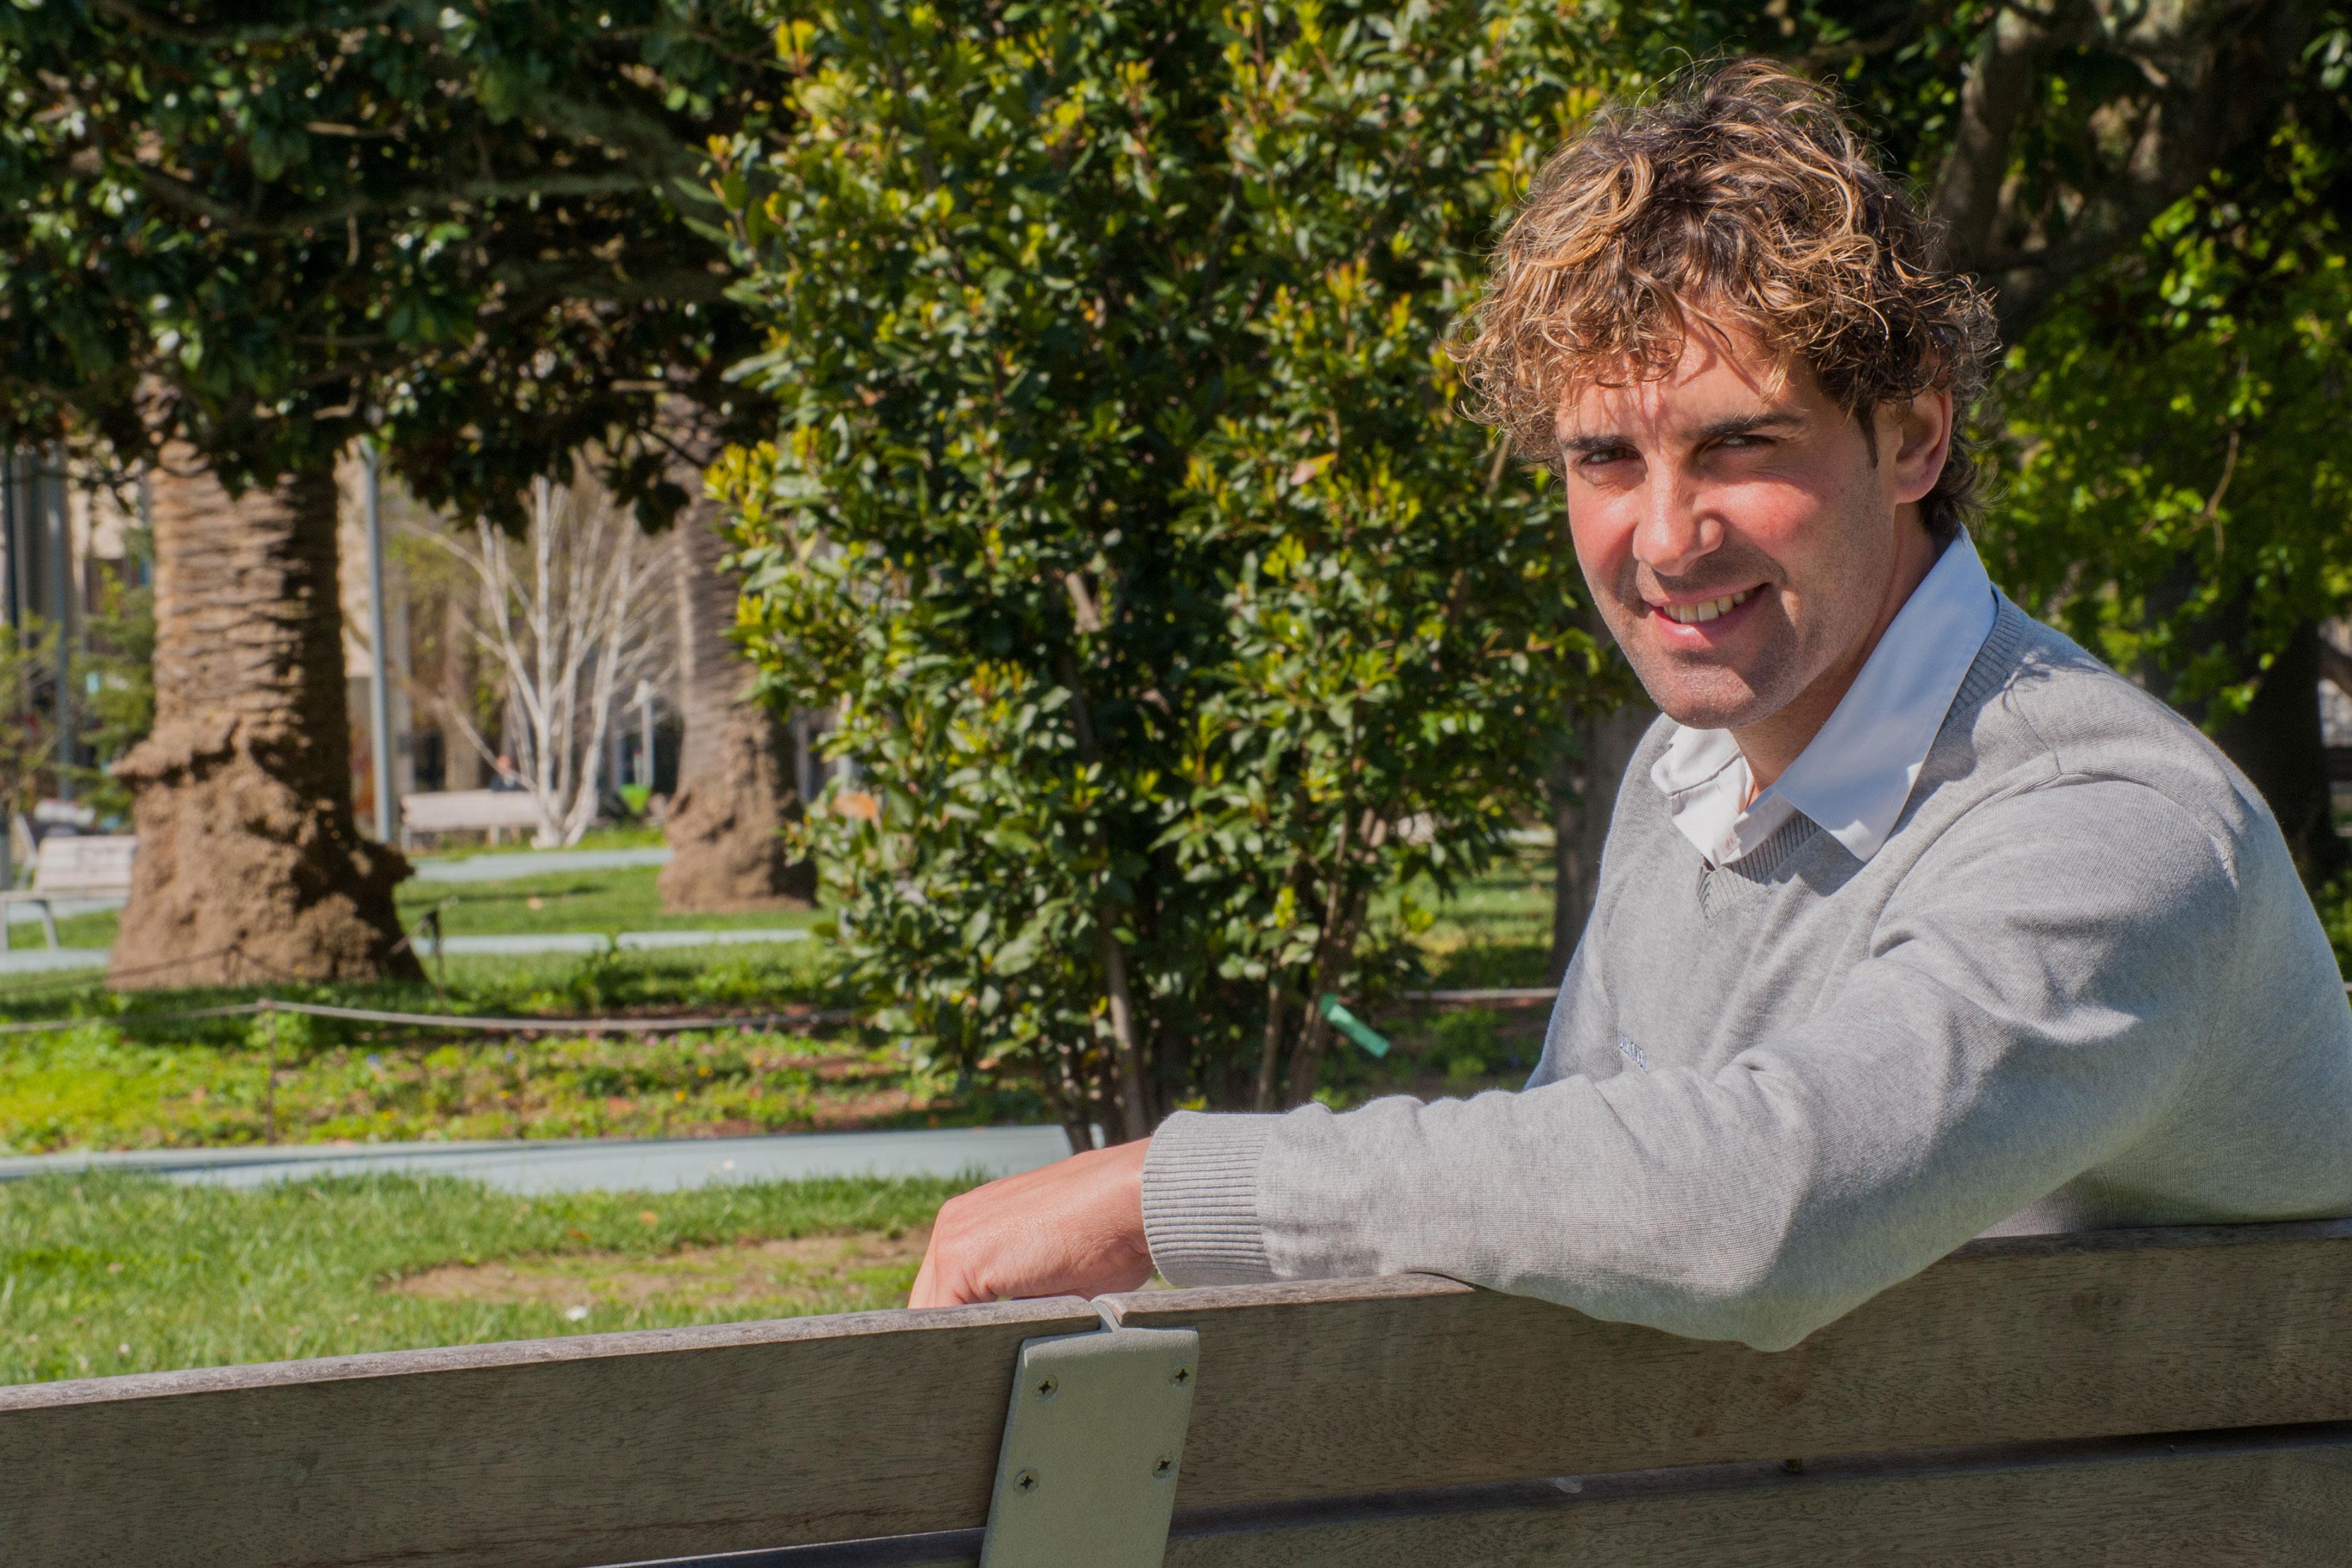 Trabajo de jardinero madrid stunning interesting com jardinero madrid ofertas de empleo - Trabajo jardinero madrid ...